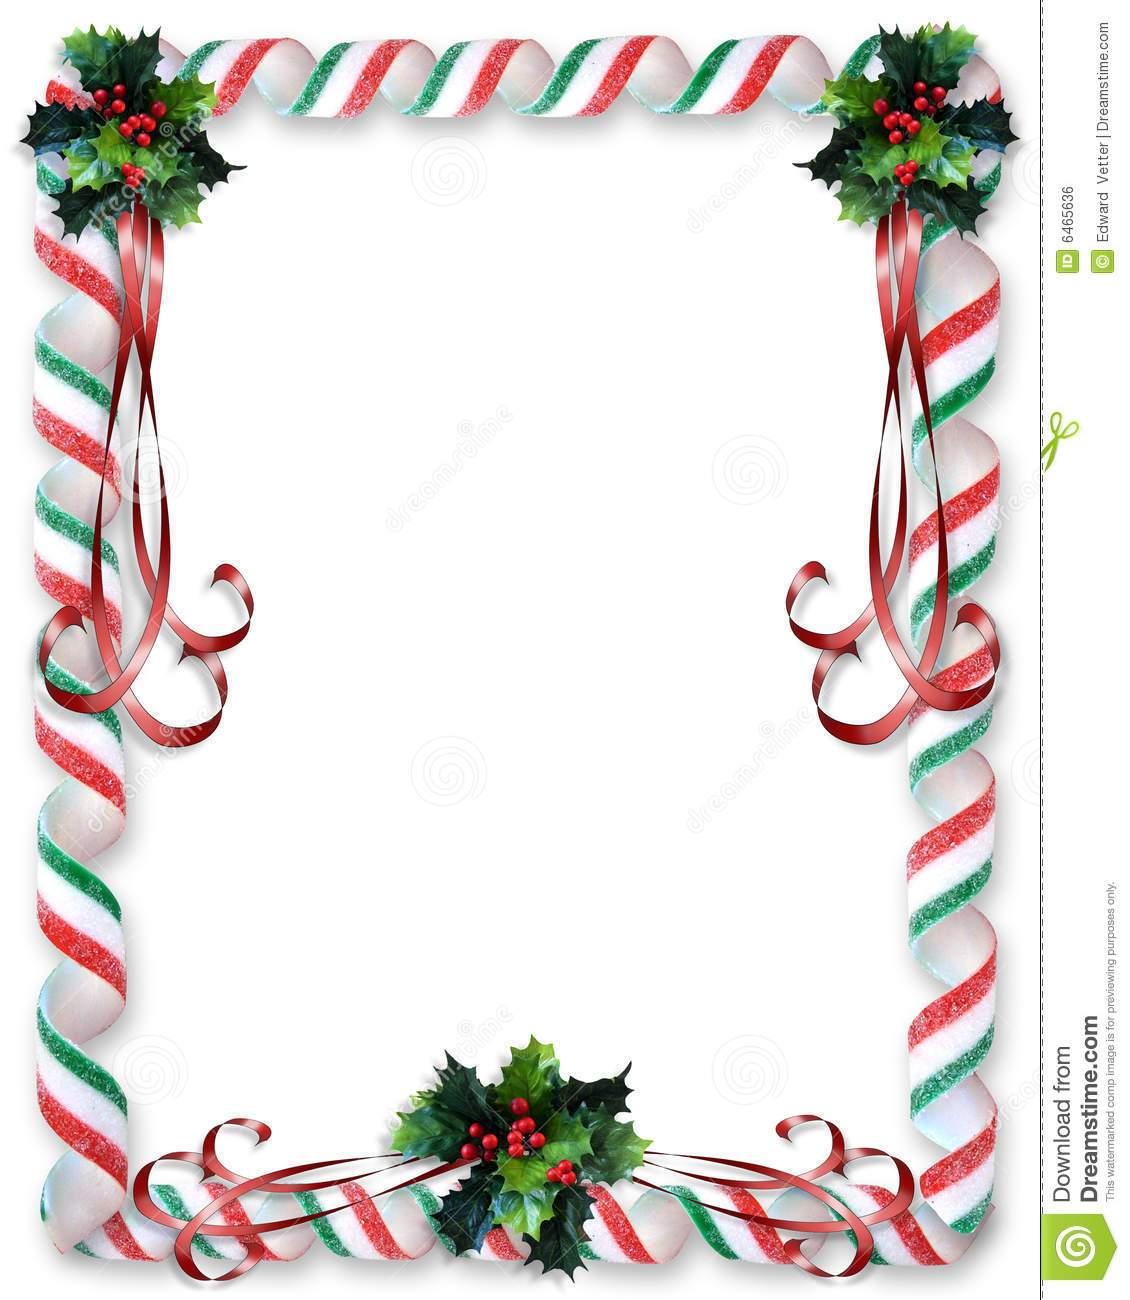 Christmas candy border clipart 7 » Clipart Portal.